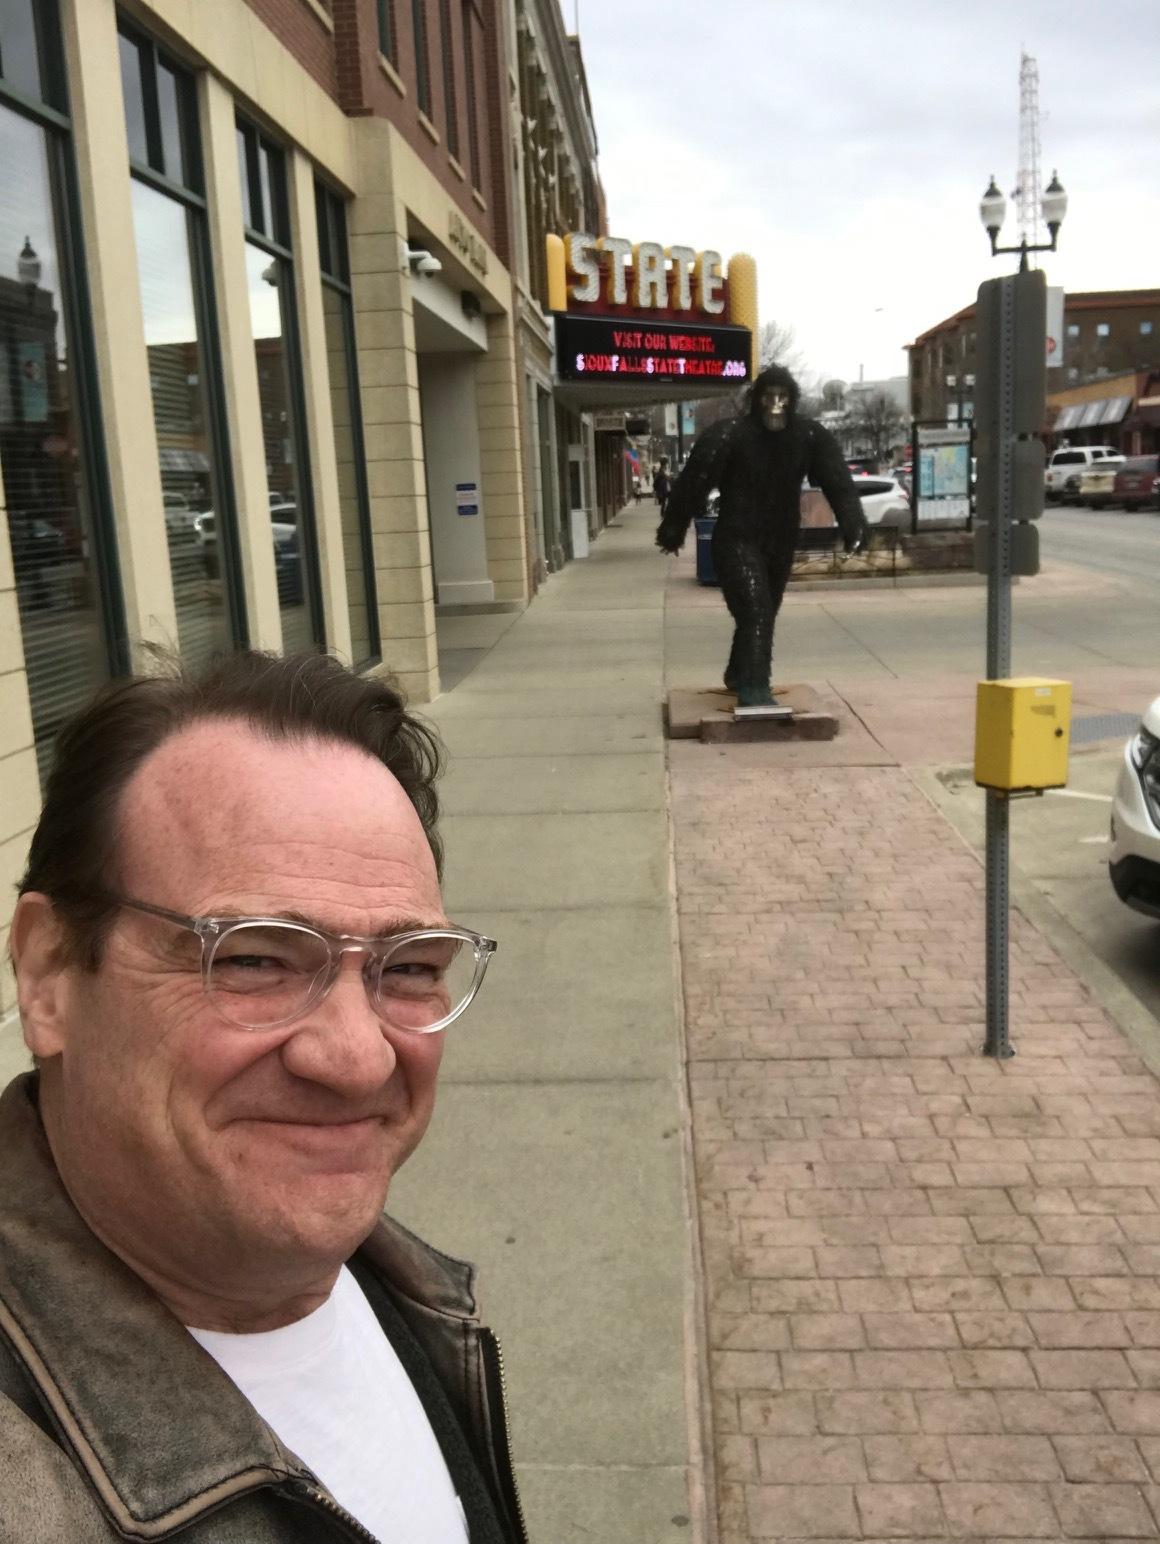 Kevin Carolan in Sioux Falls, SD